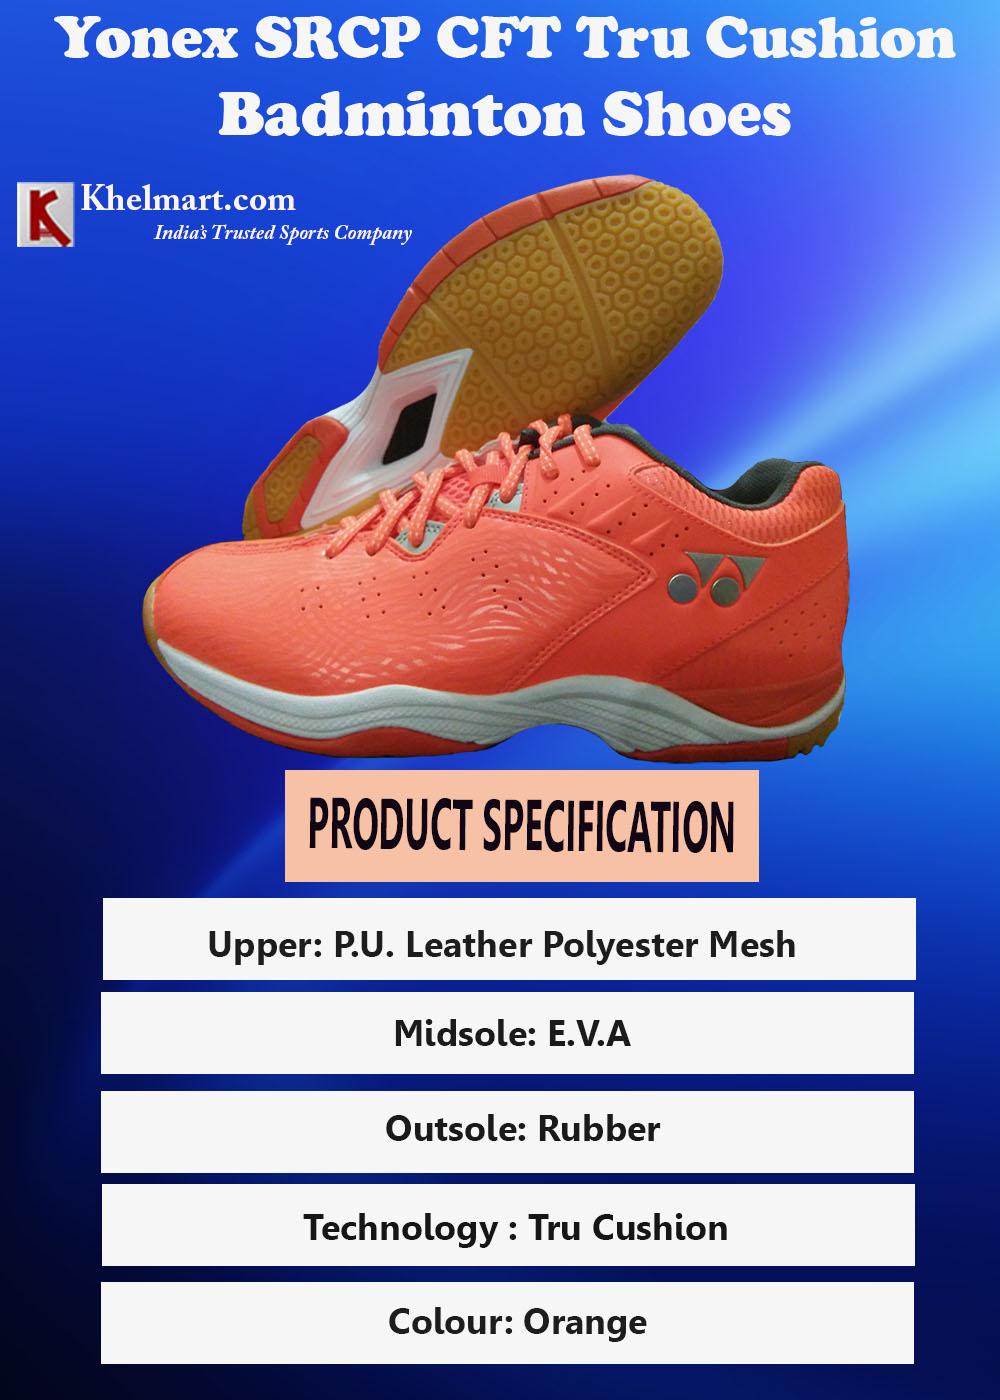 Yonex SRCP CFT Tru Cushion Badminton Shoes